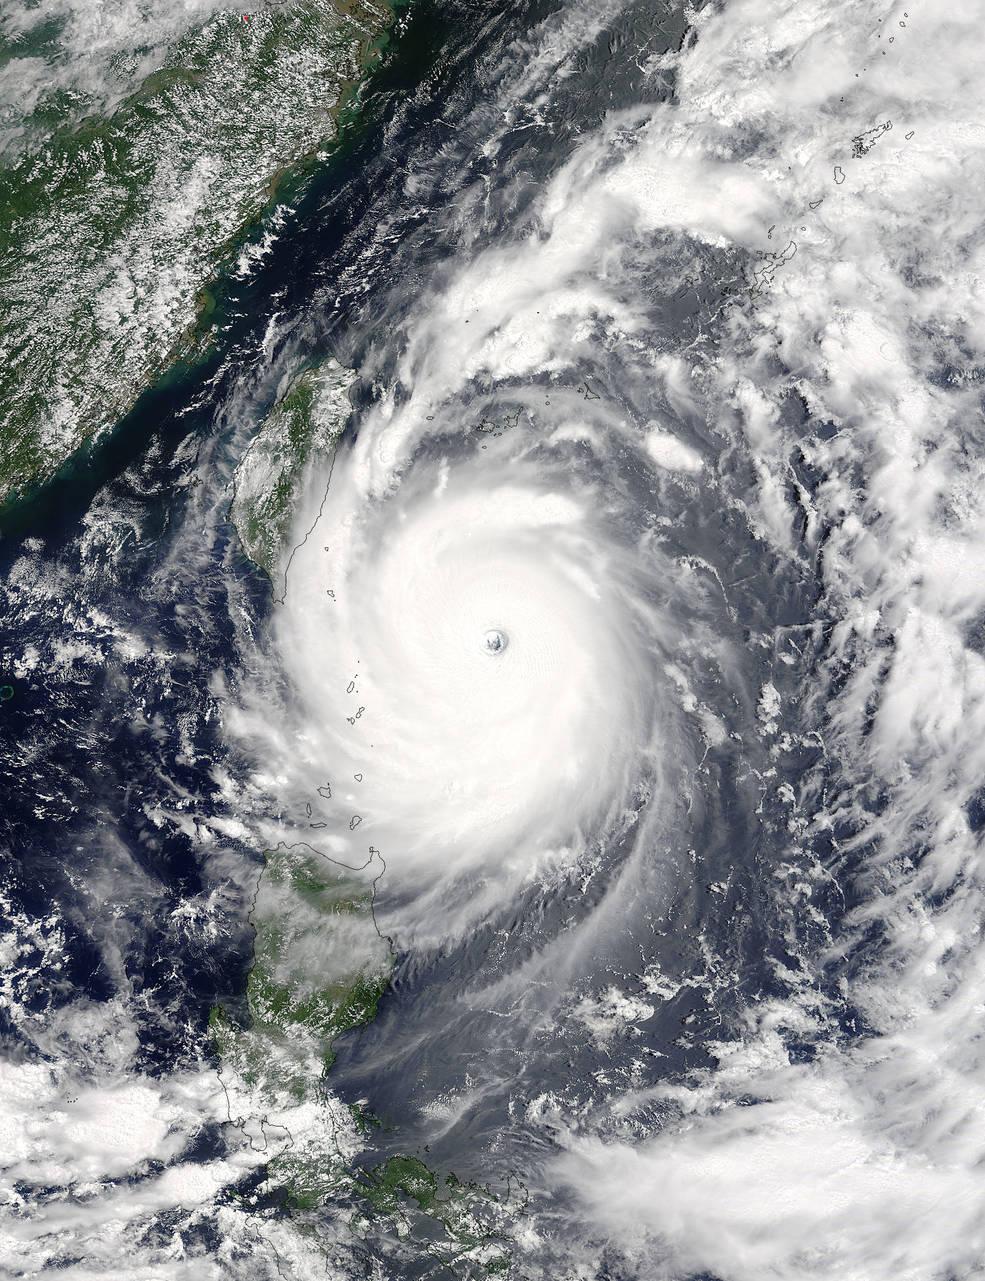 Super Typhoon Nepartak Spied from Space (Photos)